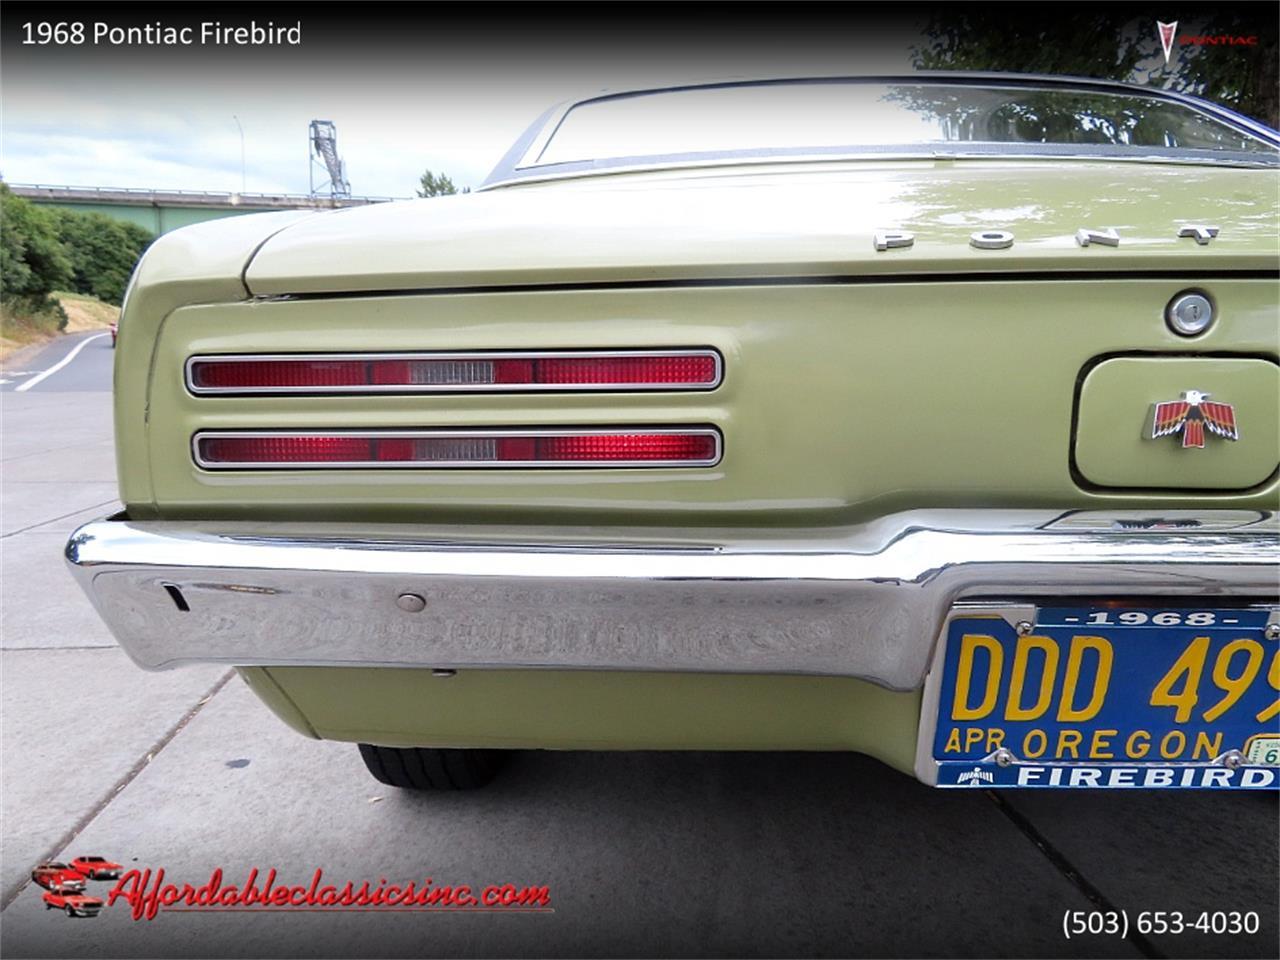 1968 Pontiac Firebird (CC-1380199) for sale in Gladstone, Oregon